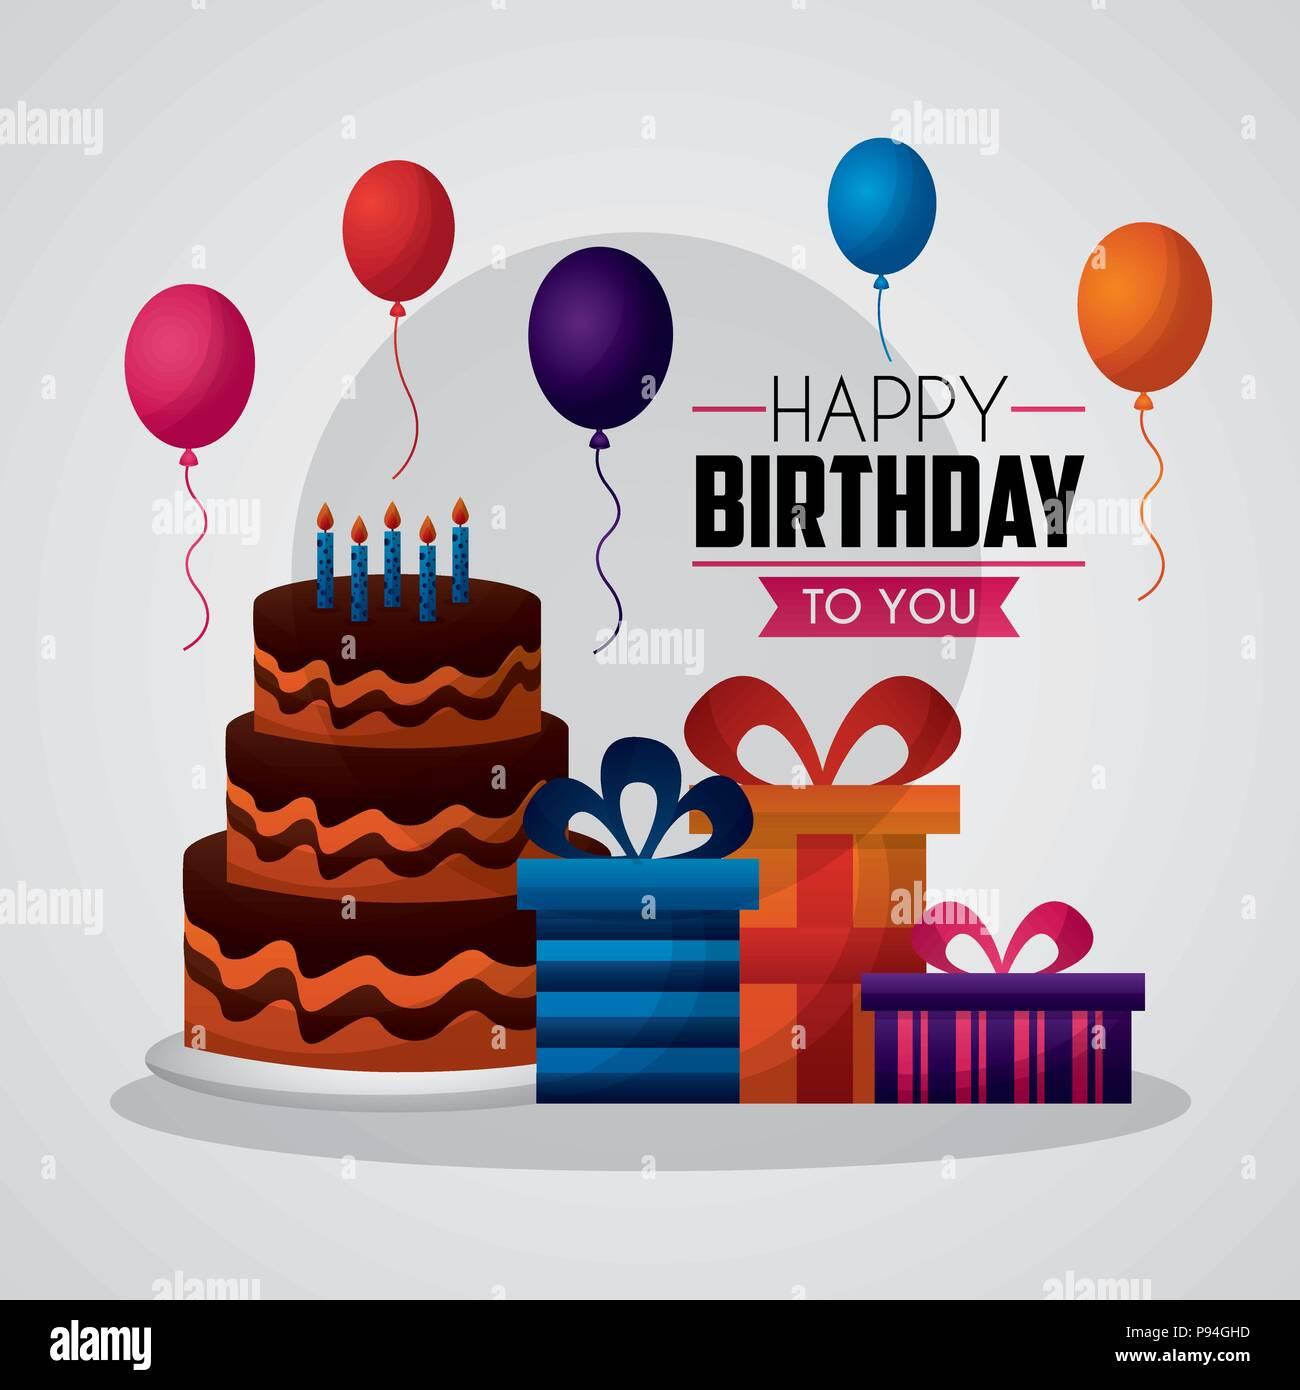 Happy Birthday Card Party Celebrate Balloons Three Story Cake